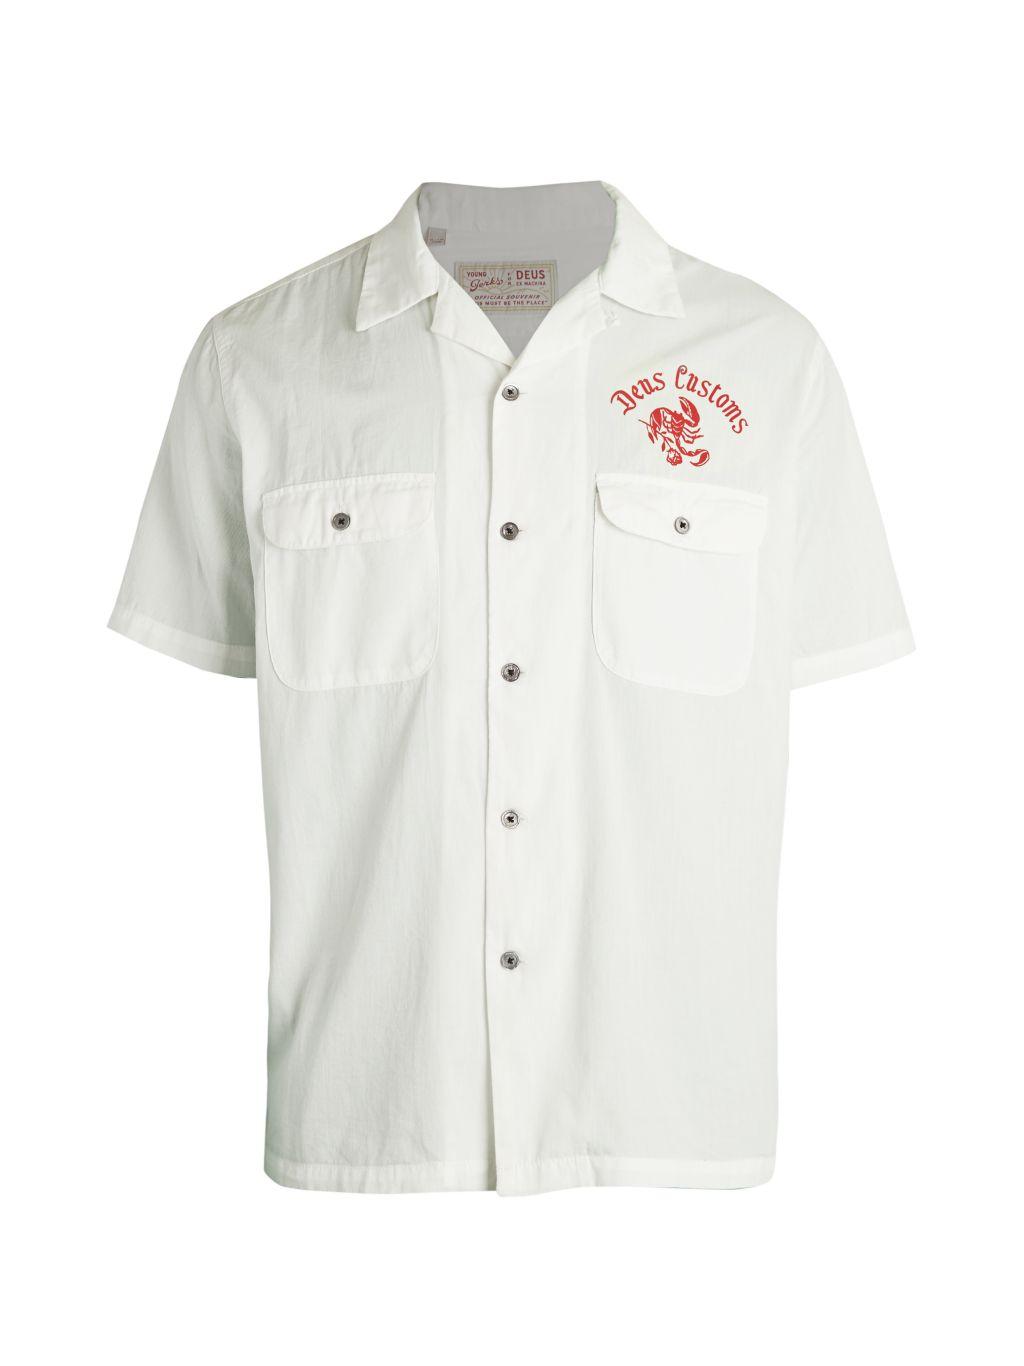 Deus Ex Machina Deux Ex Machina x Young Jerks Smile Back Cotton Shirt